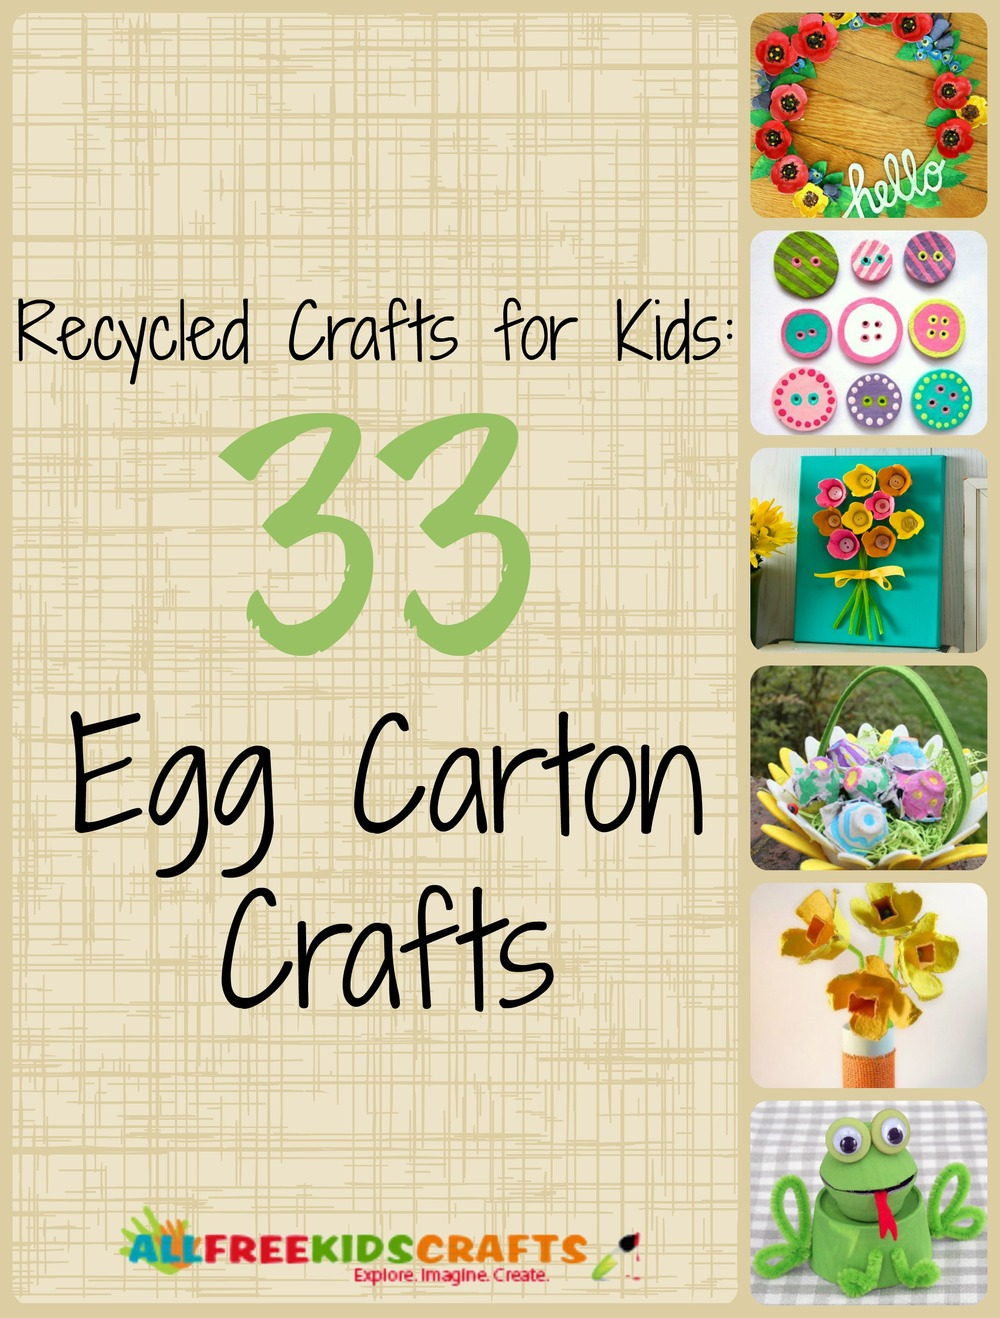 Recycled Crafts For Kids 33 Carton Crafts Allfreekidscrafts Com